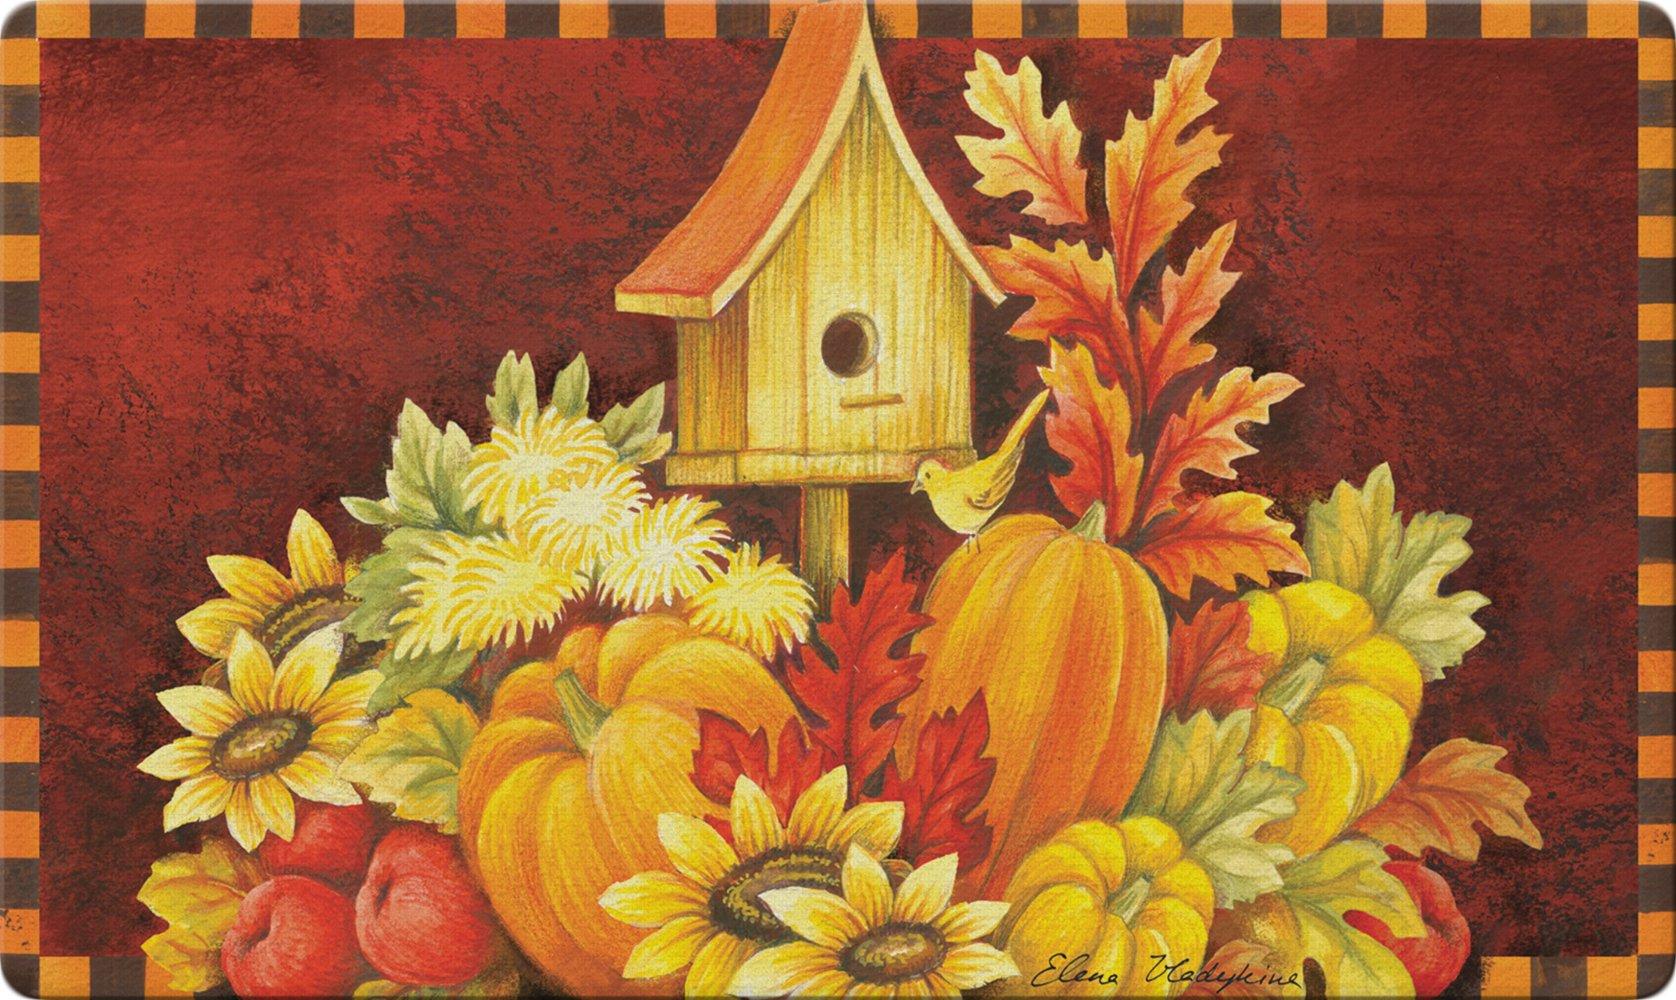 "Toland Home Garden 830287 Fall Birdhouse 18"" x 30""  Recycled Mat, USA Produced"